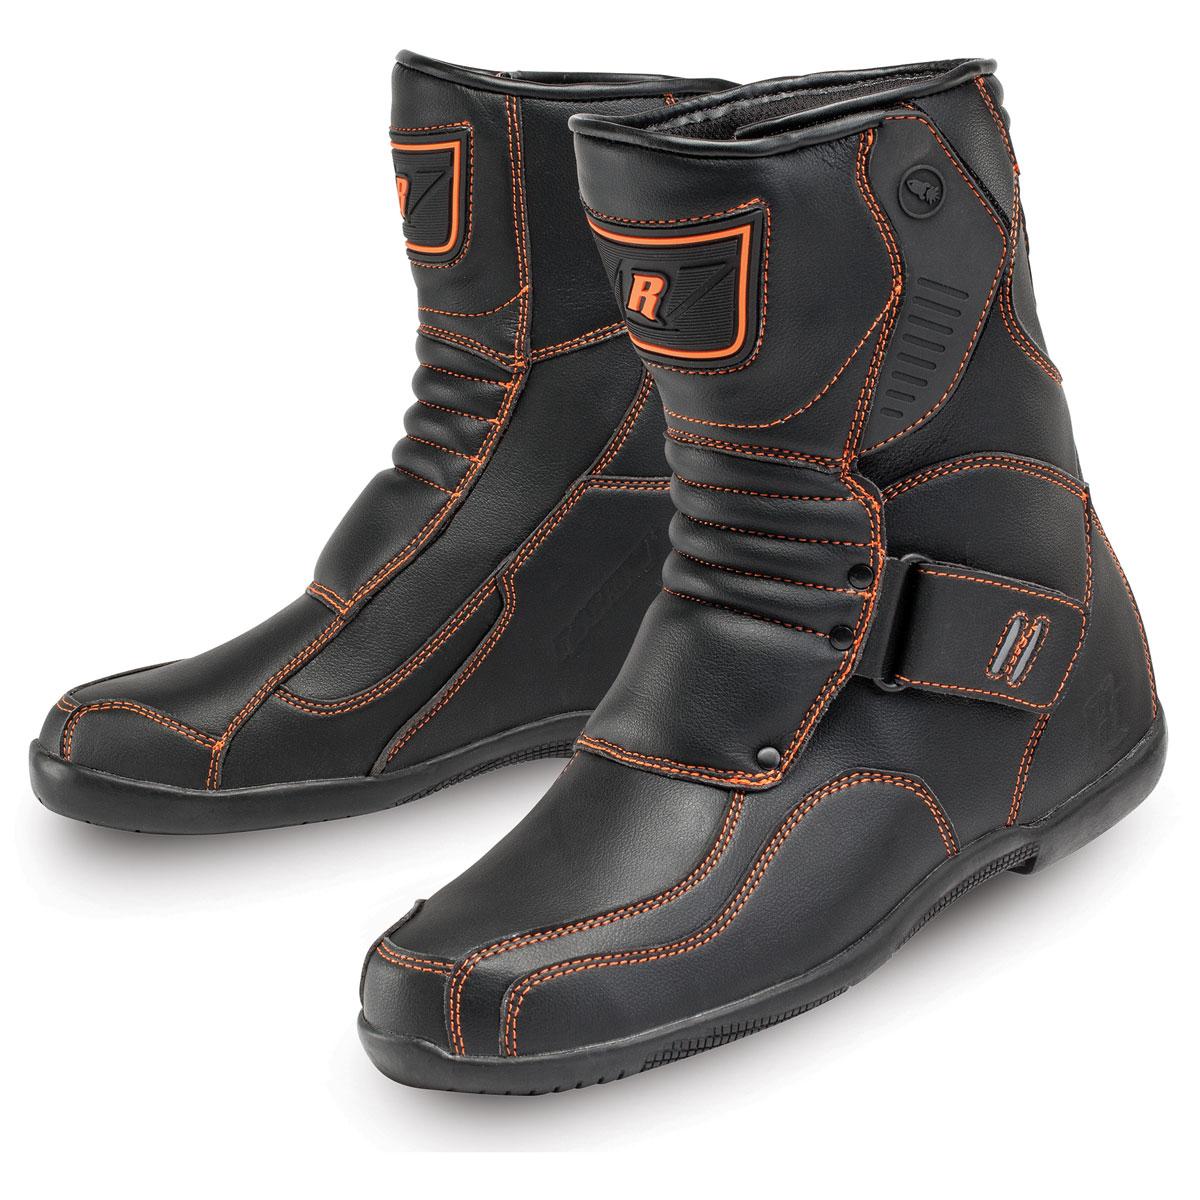 Joe Rocket Men's Mercury Black/Orange Leather Boots